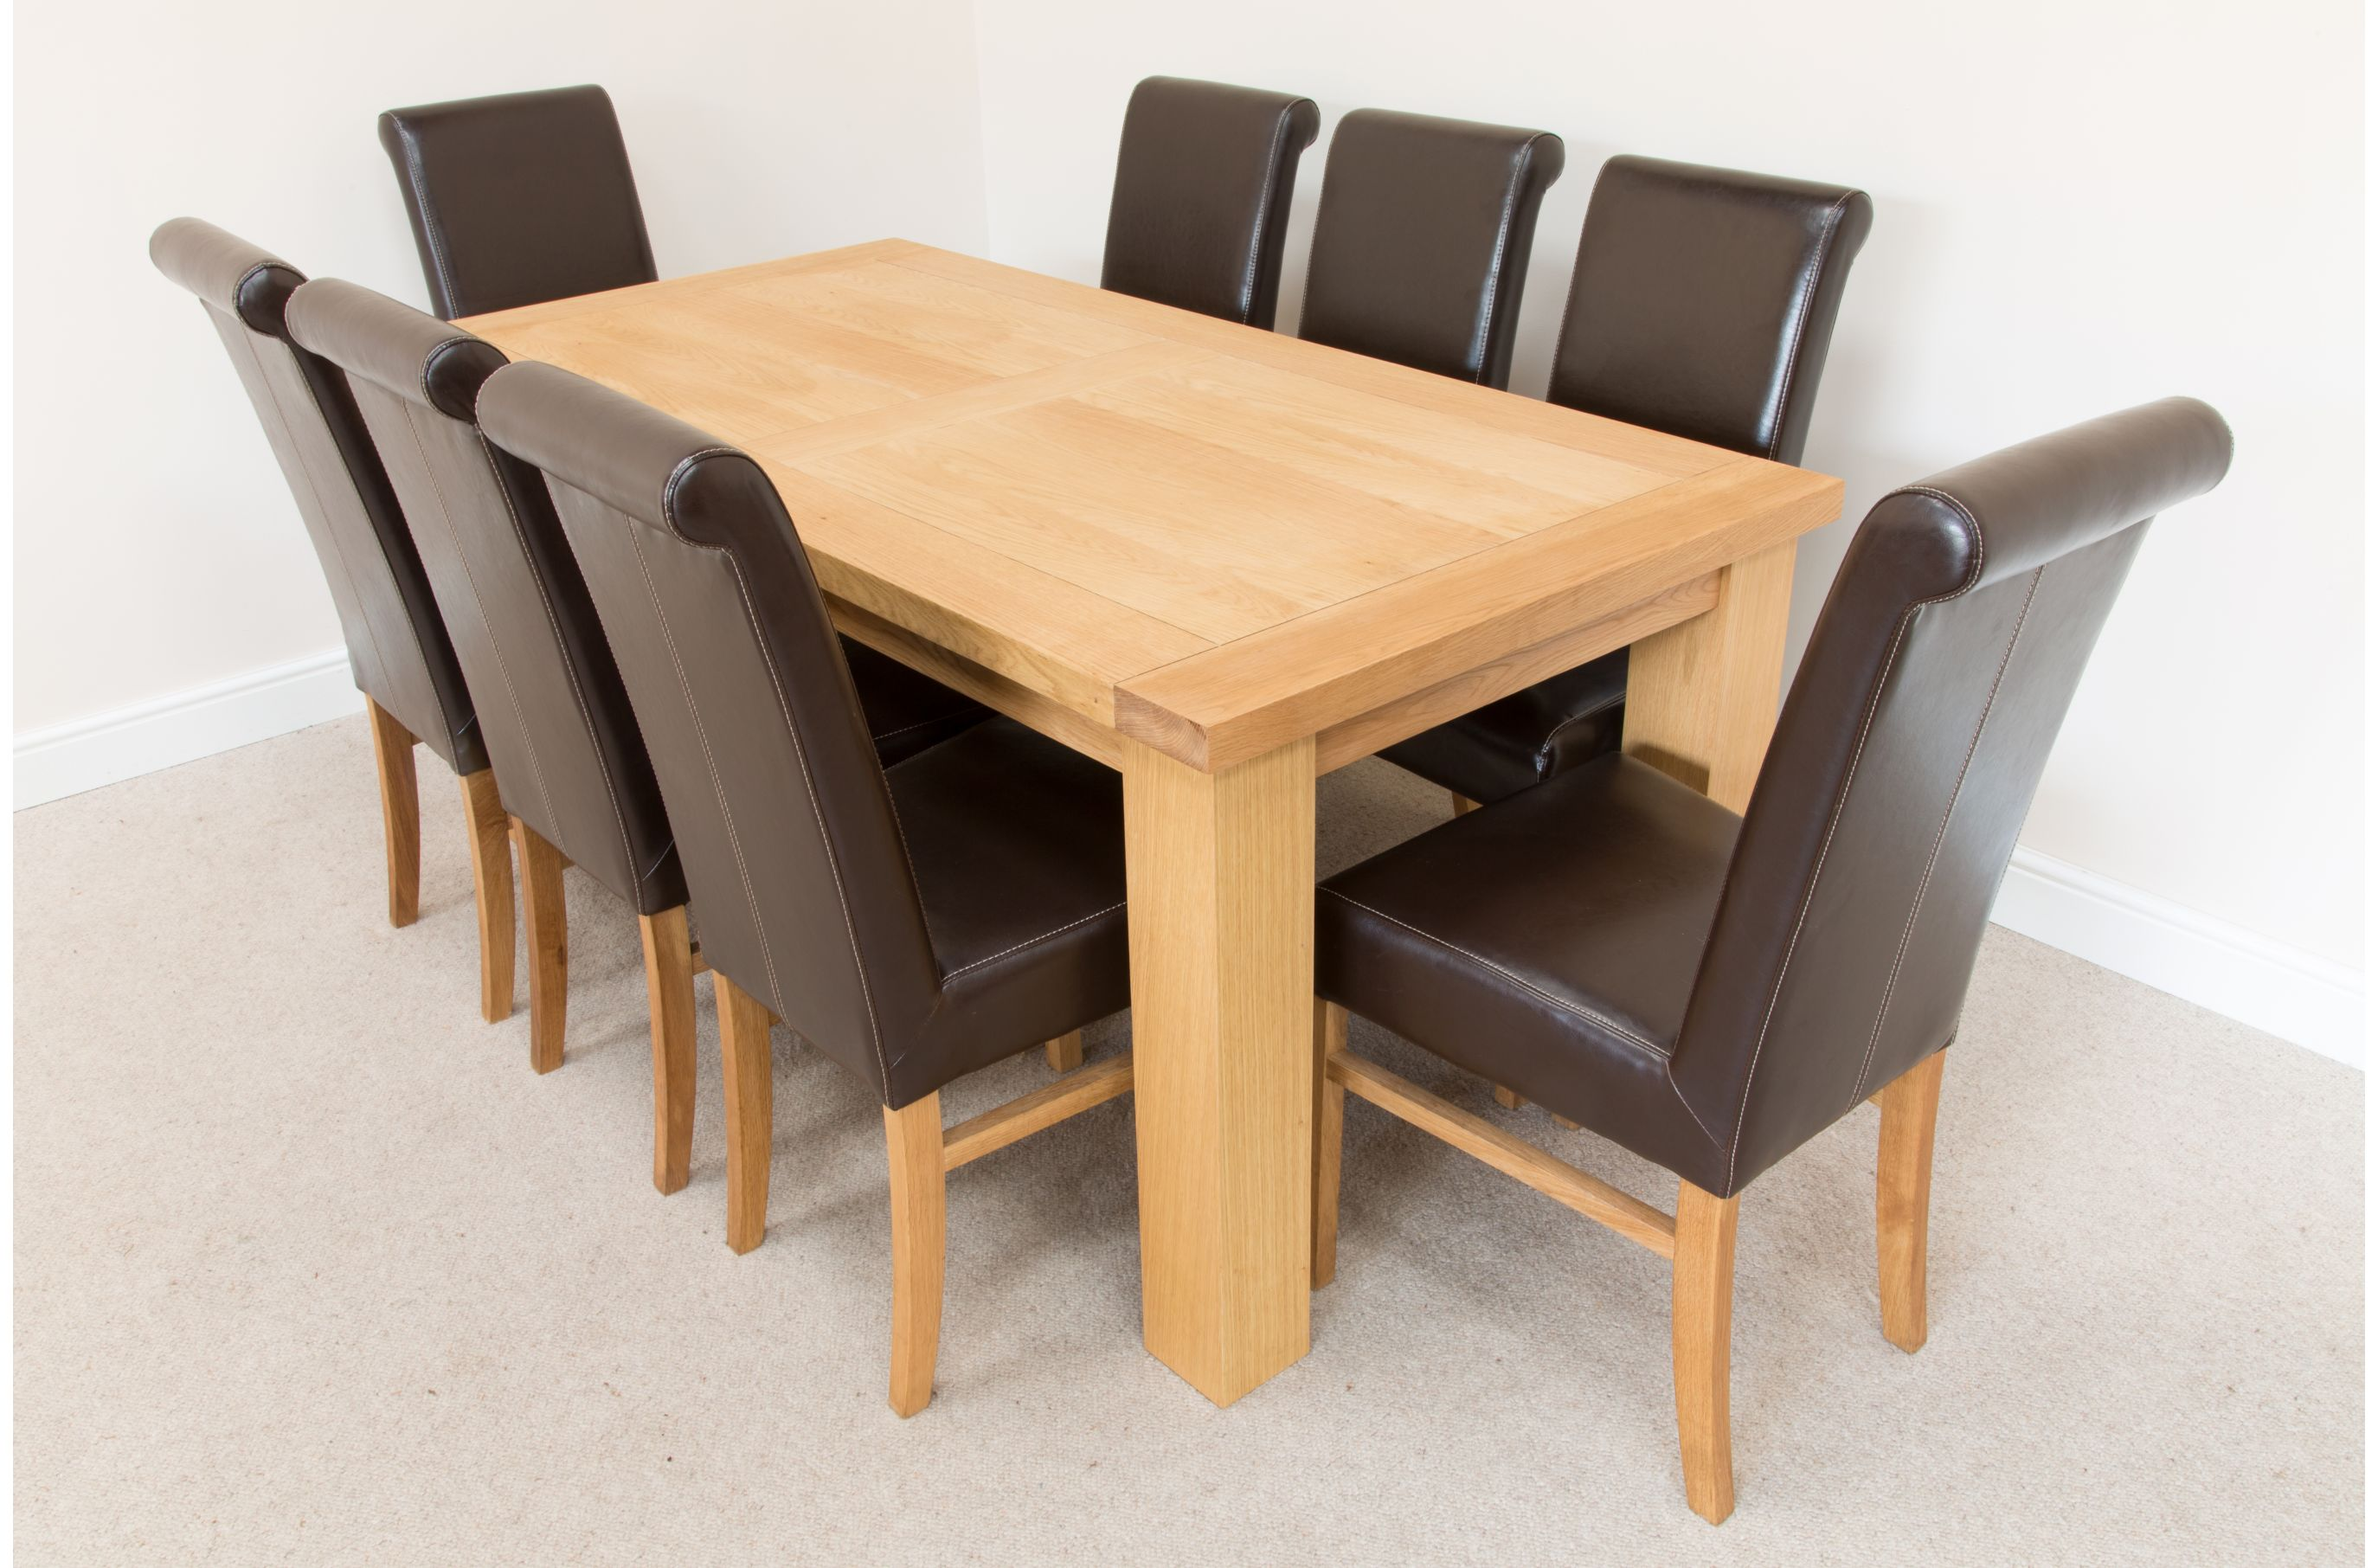 oak dining sets why choosing oak dining room sets PIMEQFG